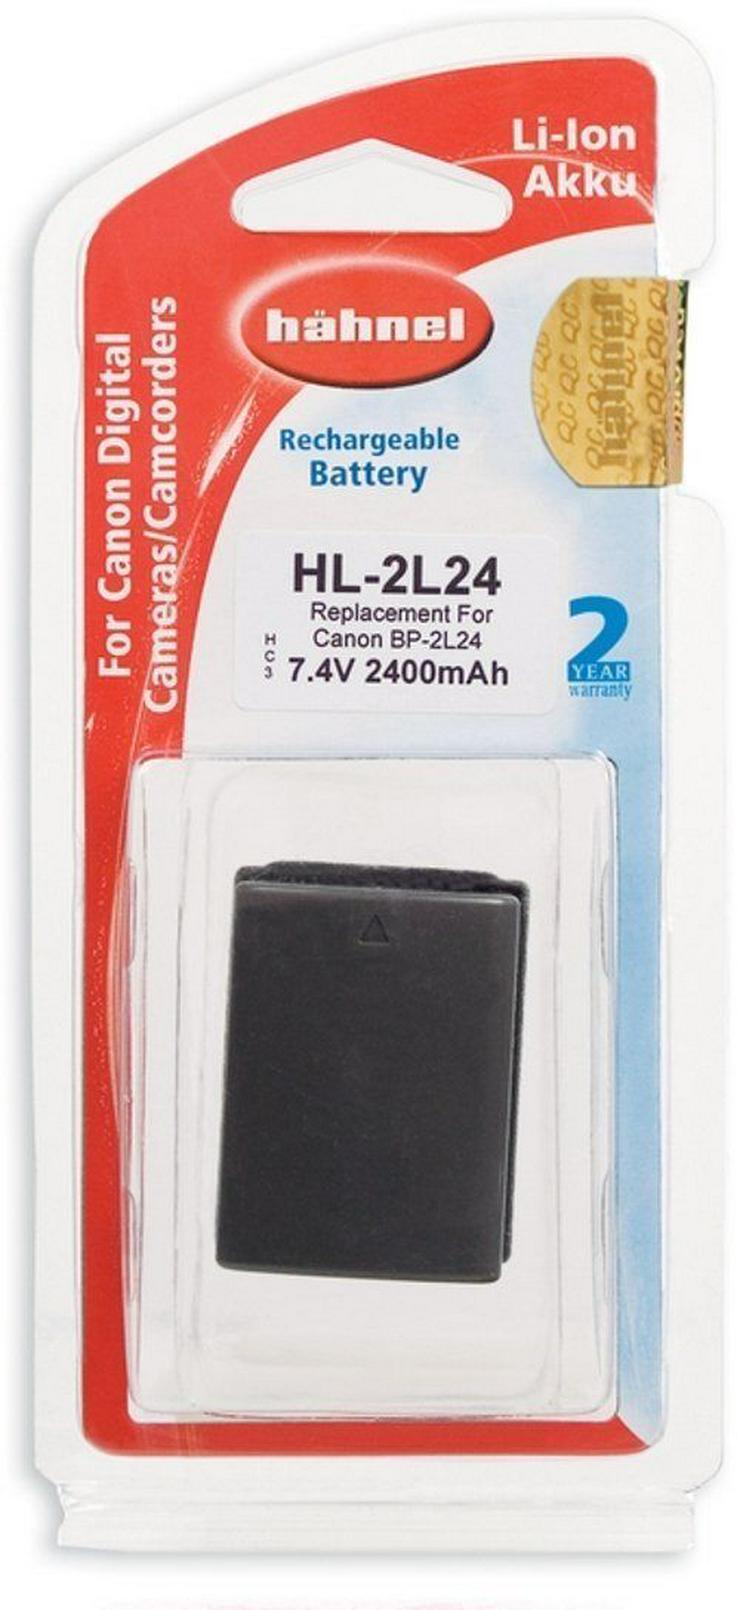 Hähnel HL-2L24 Li-Ion Akku 2400mAh 7.4V für Canon Digital Cameras/Camcorders